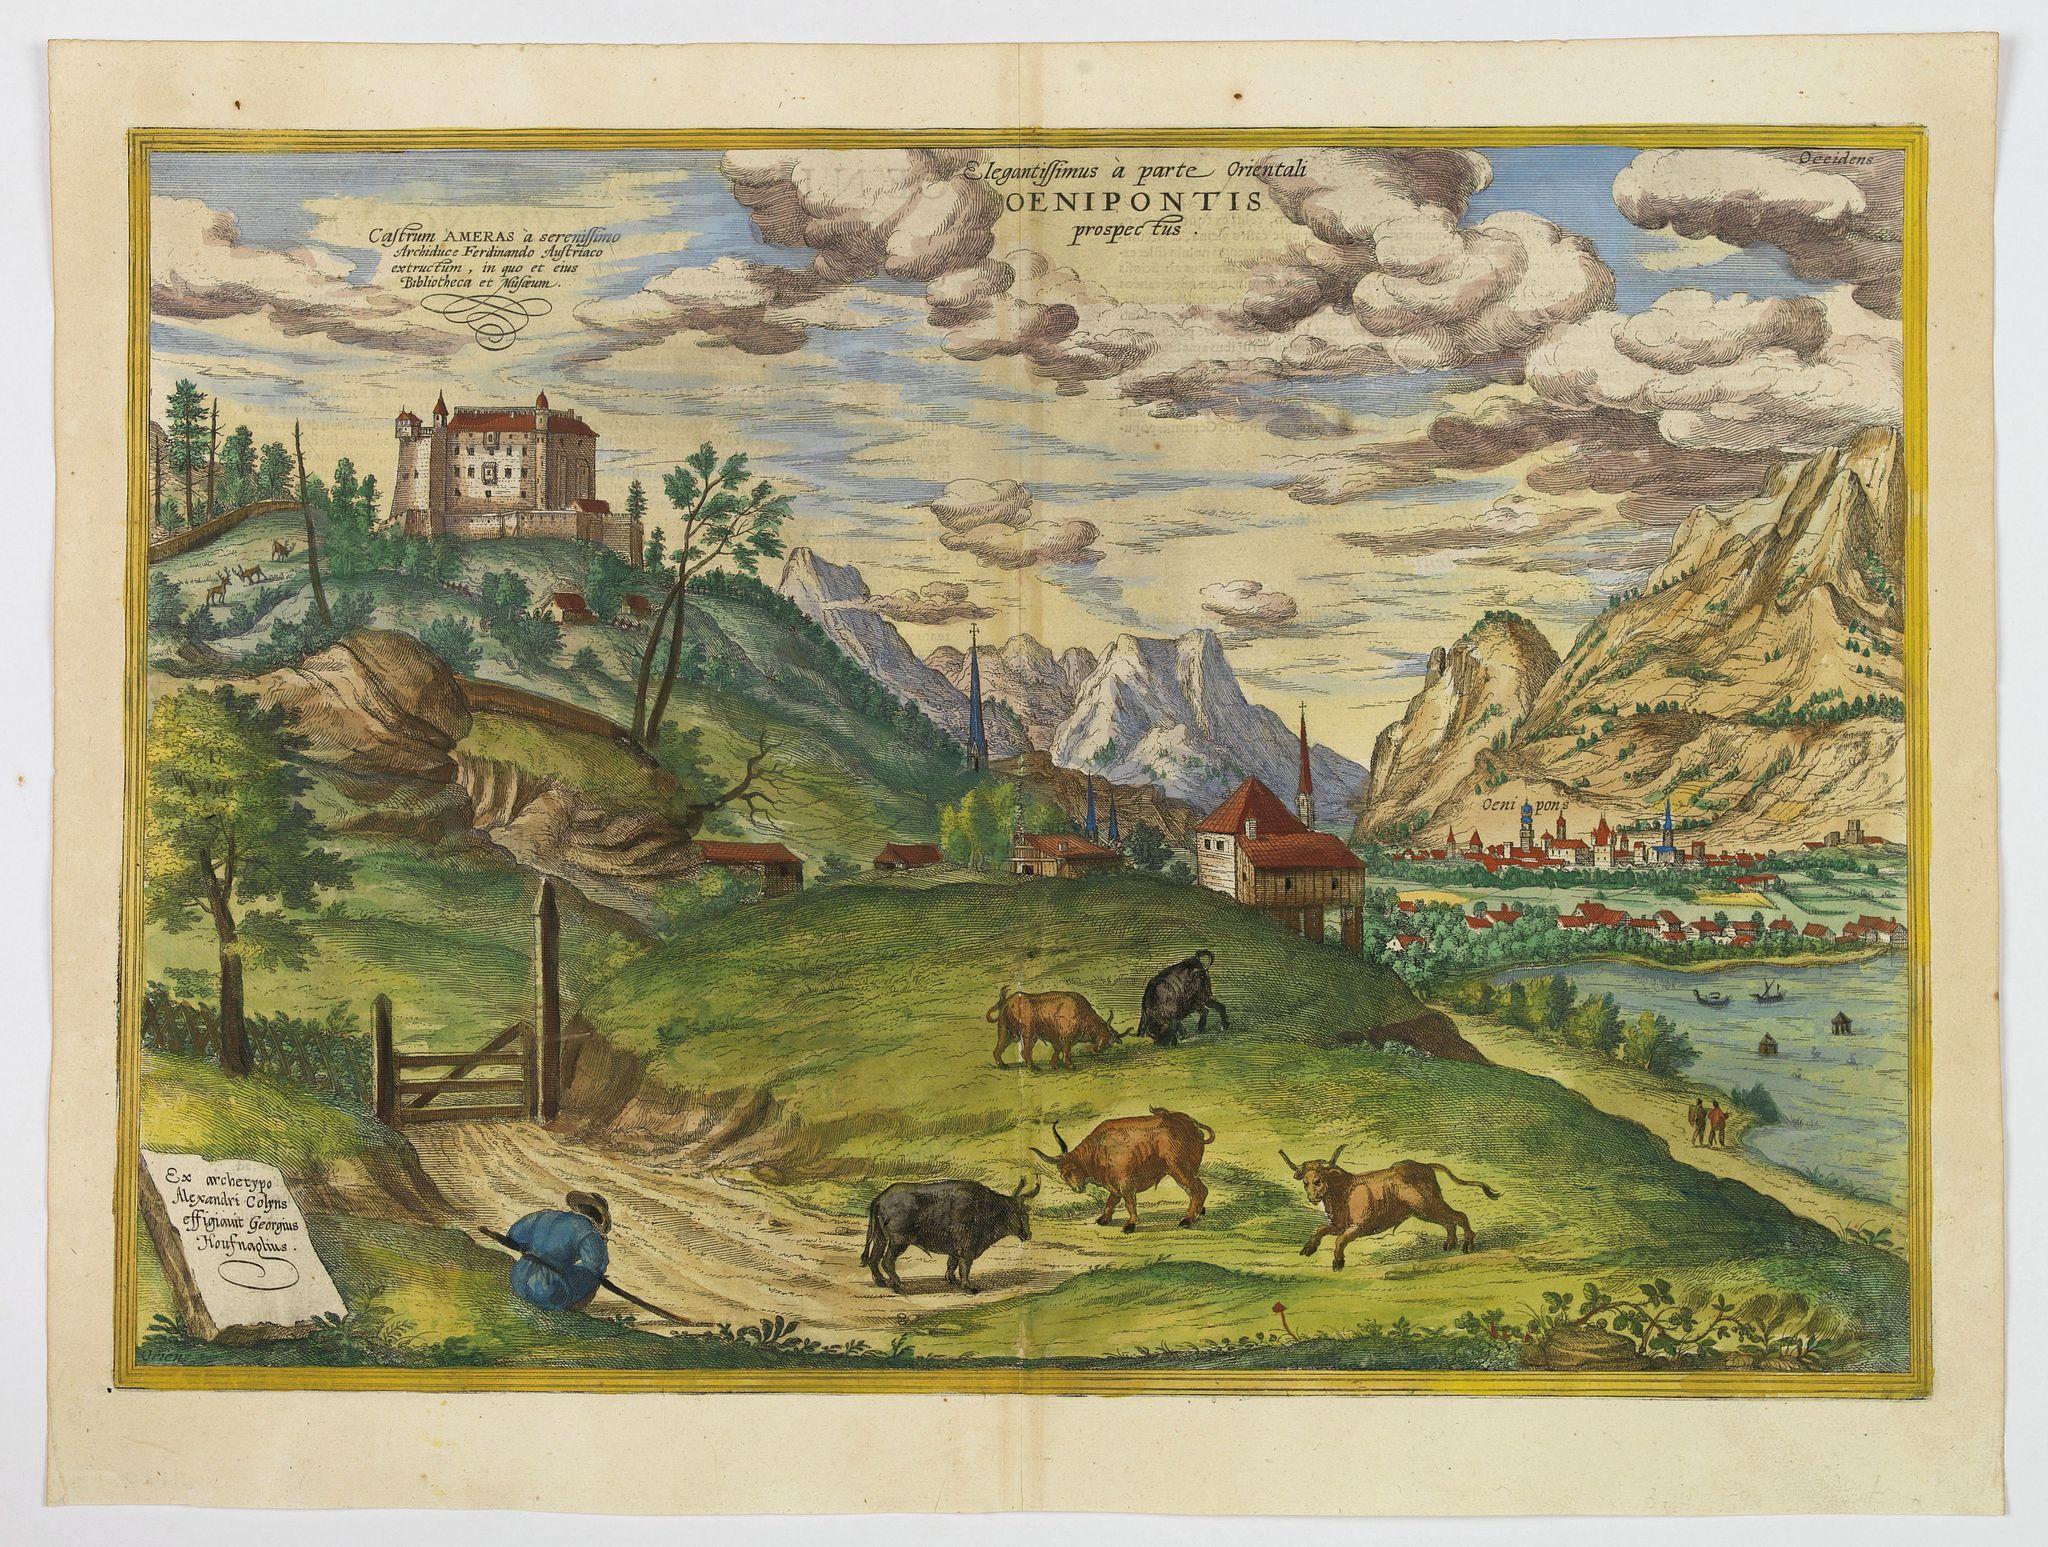 BRAUN,G. / HOGENBERG, F. -  Elegantissimus a parte Orientali Oenipontis prospectus.